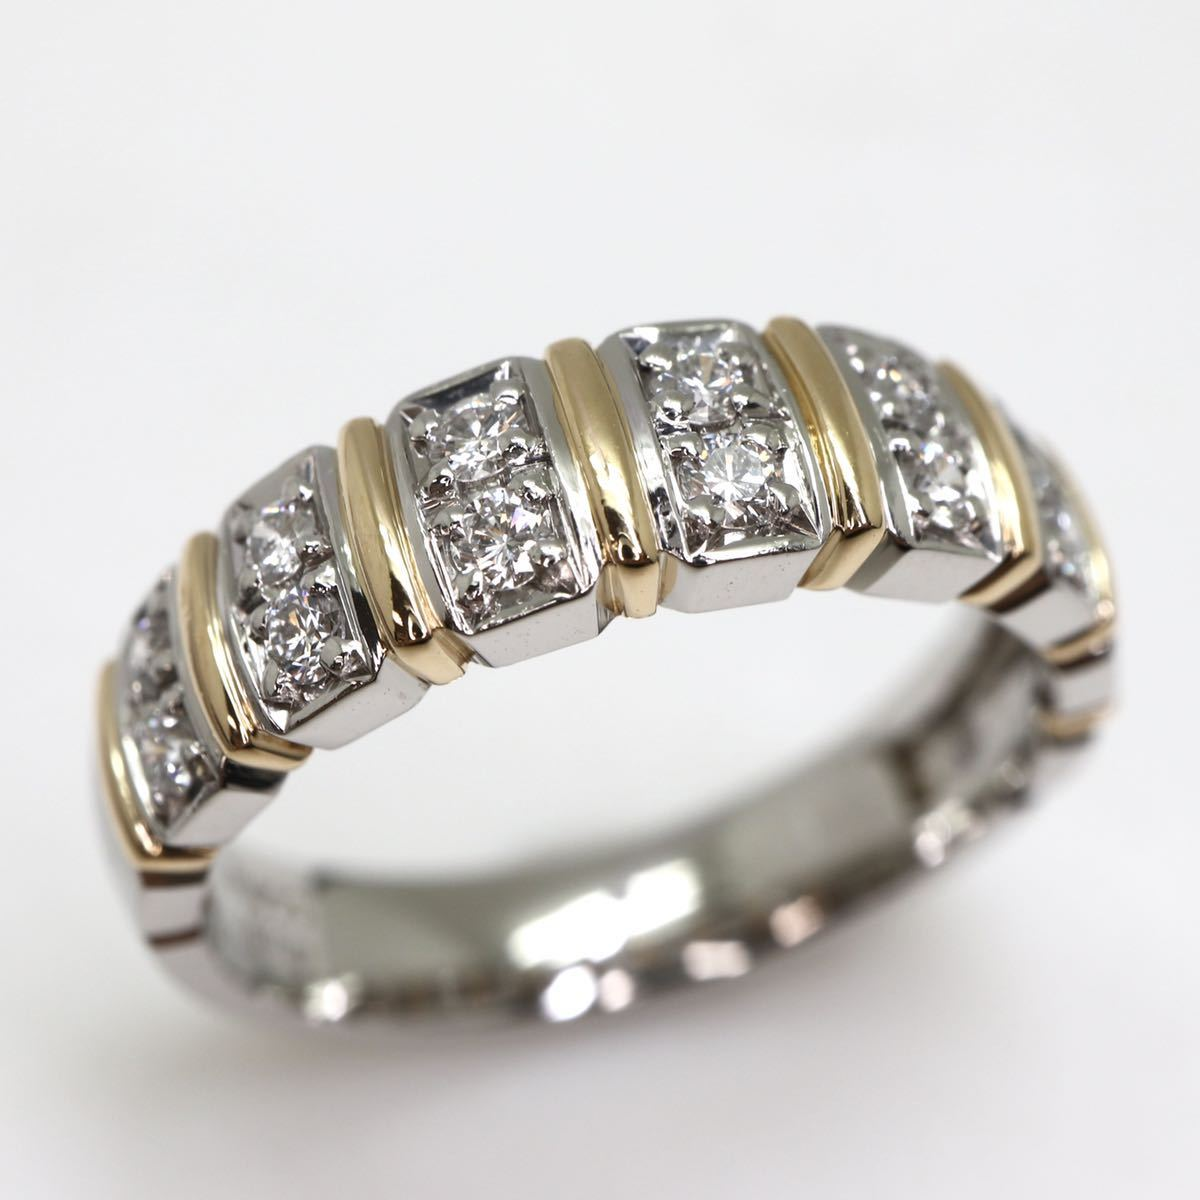 【Ambrose(アンブローズ)】天然ダイヤモンドリング 0.27ct Pt900/K18 5.4g 【サイズ変更無料】【新品仕上げ済】EB3